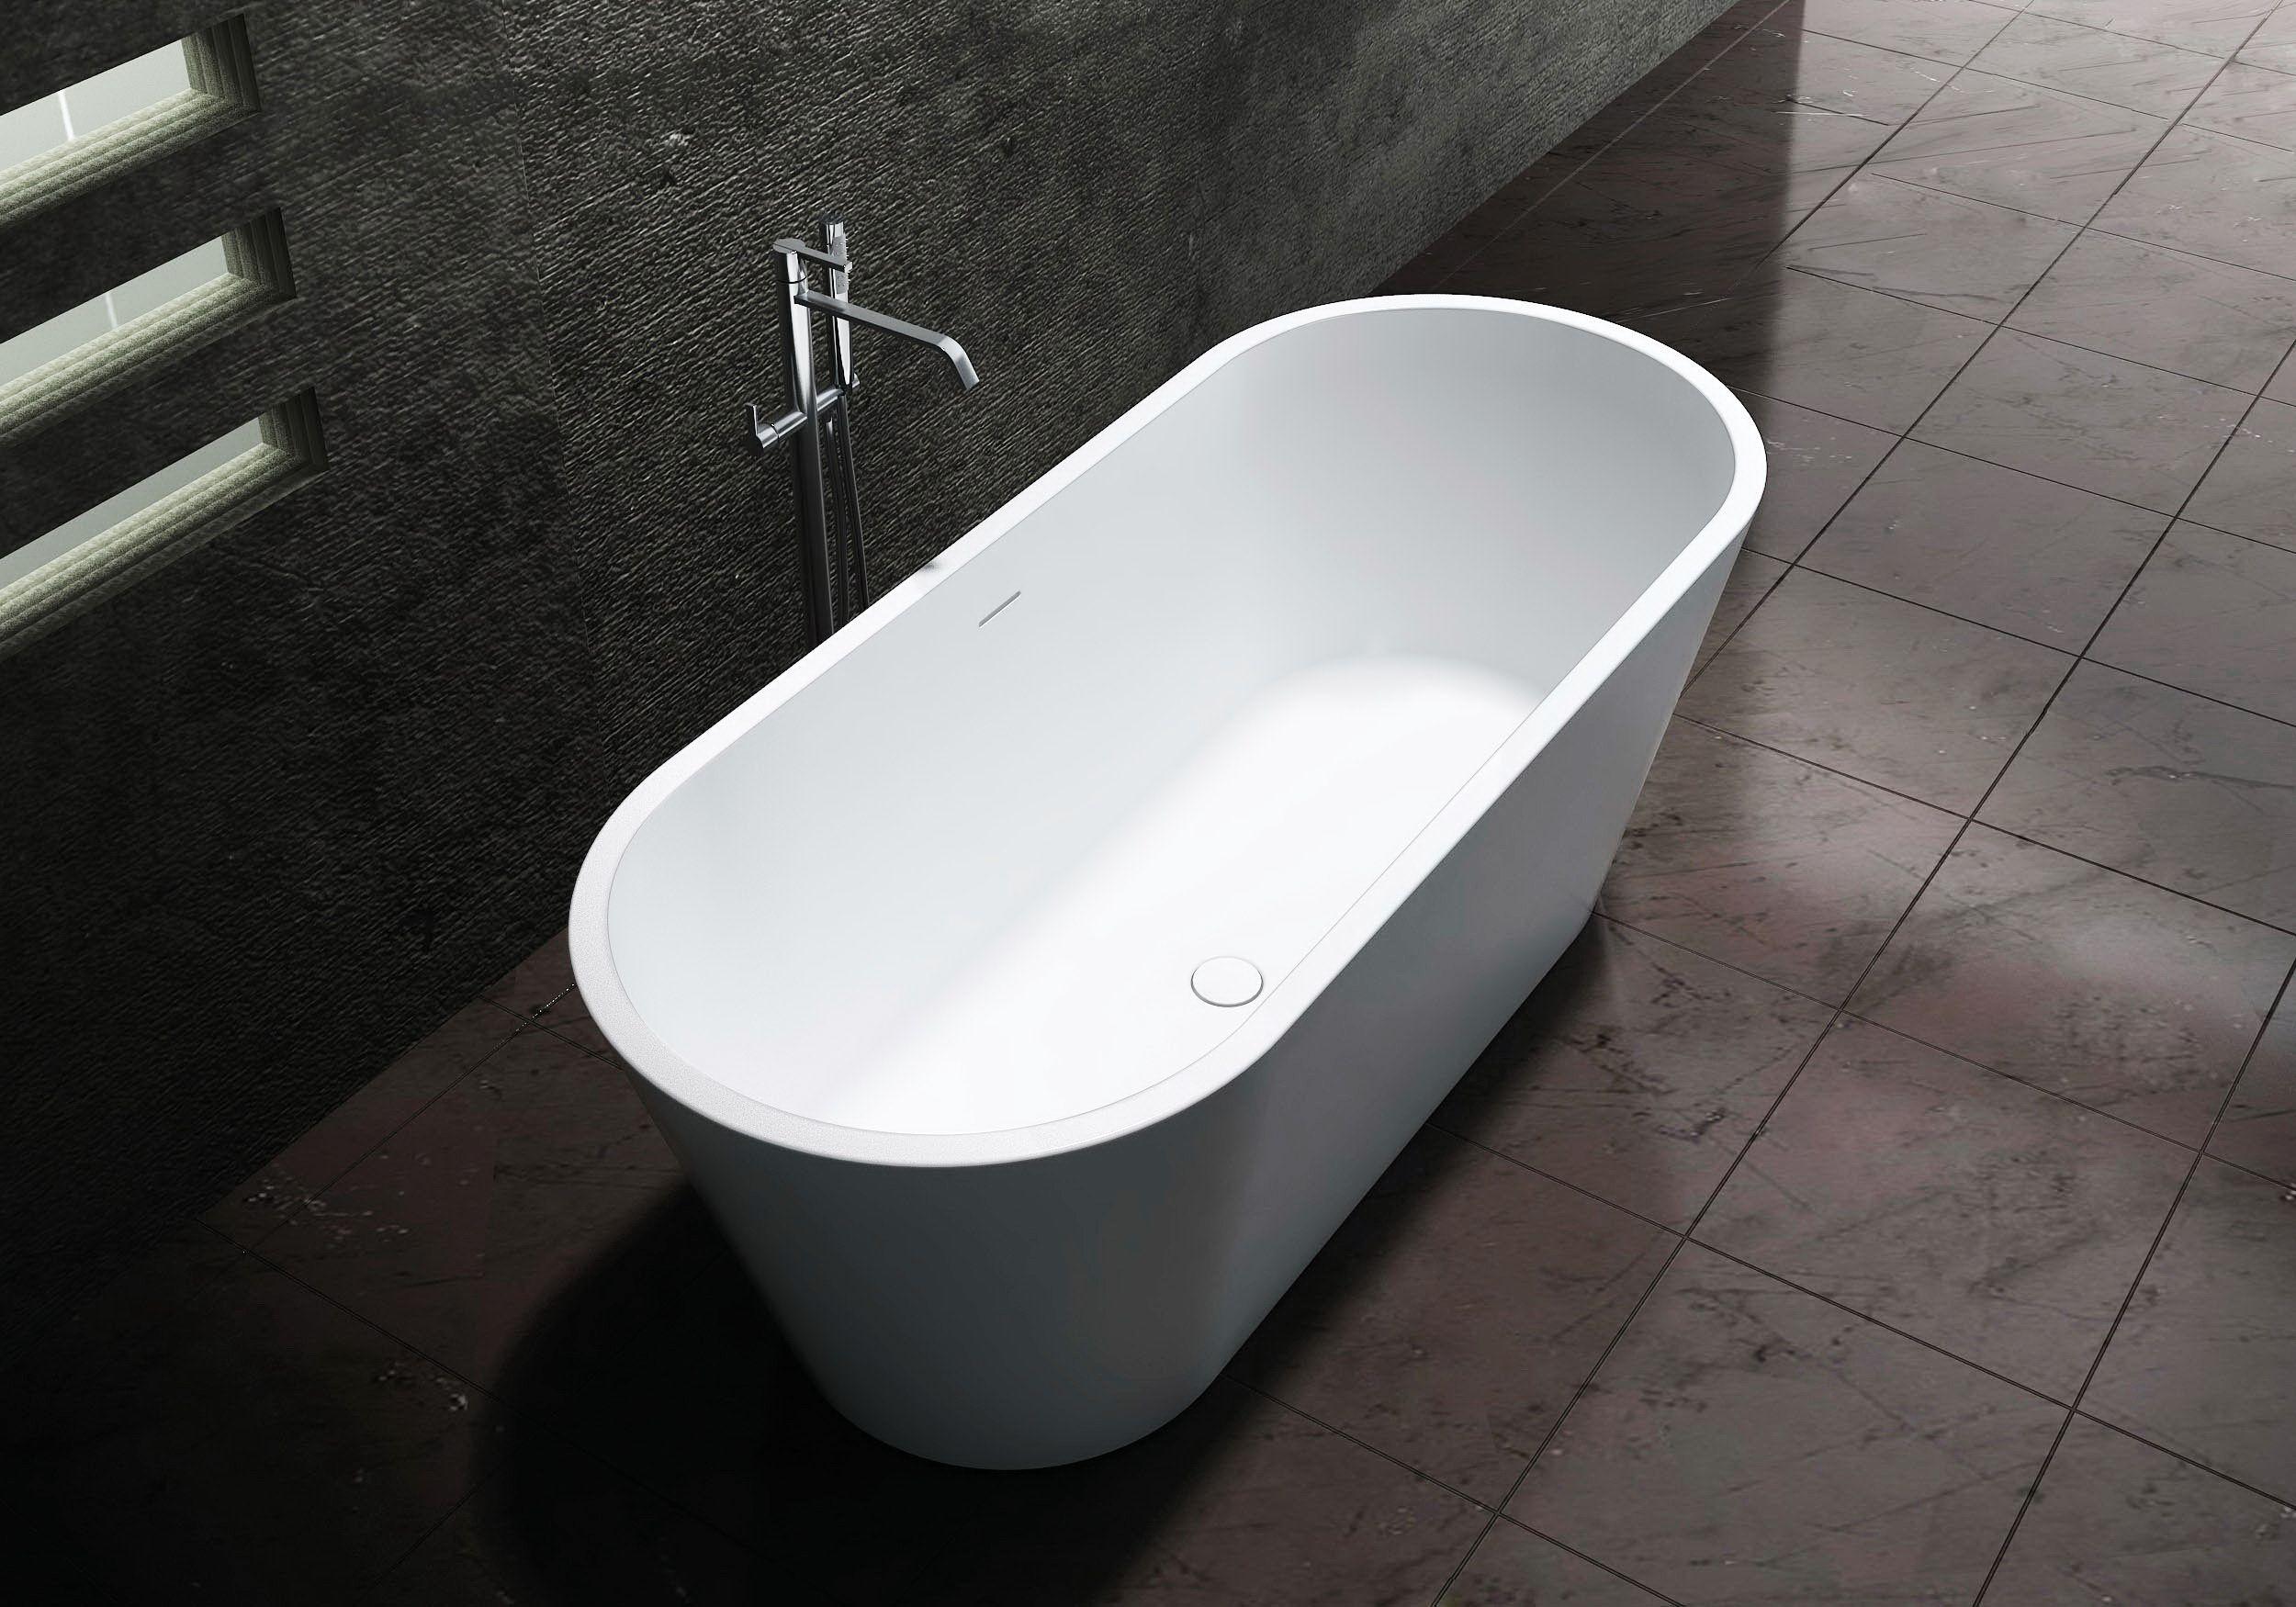 Salle De Bain Vasque Ilot ~ baignoire lot en pierre solide solid surface almeria stone blanc